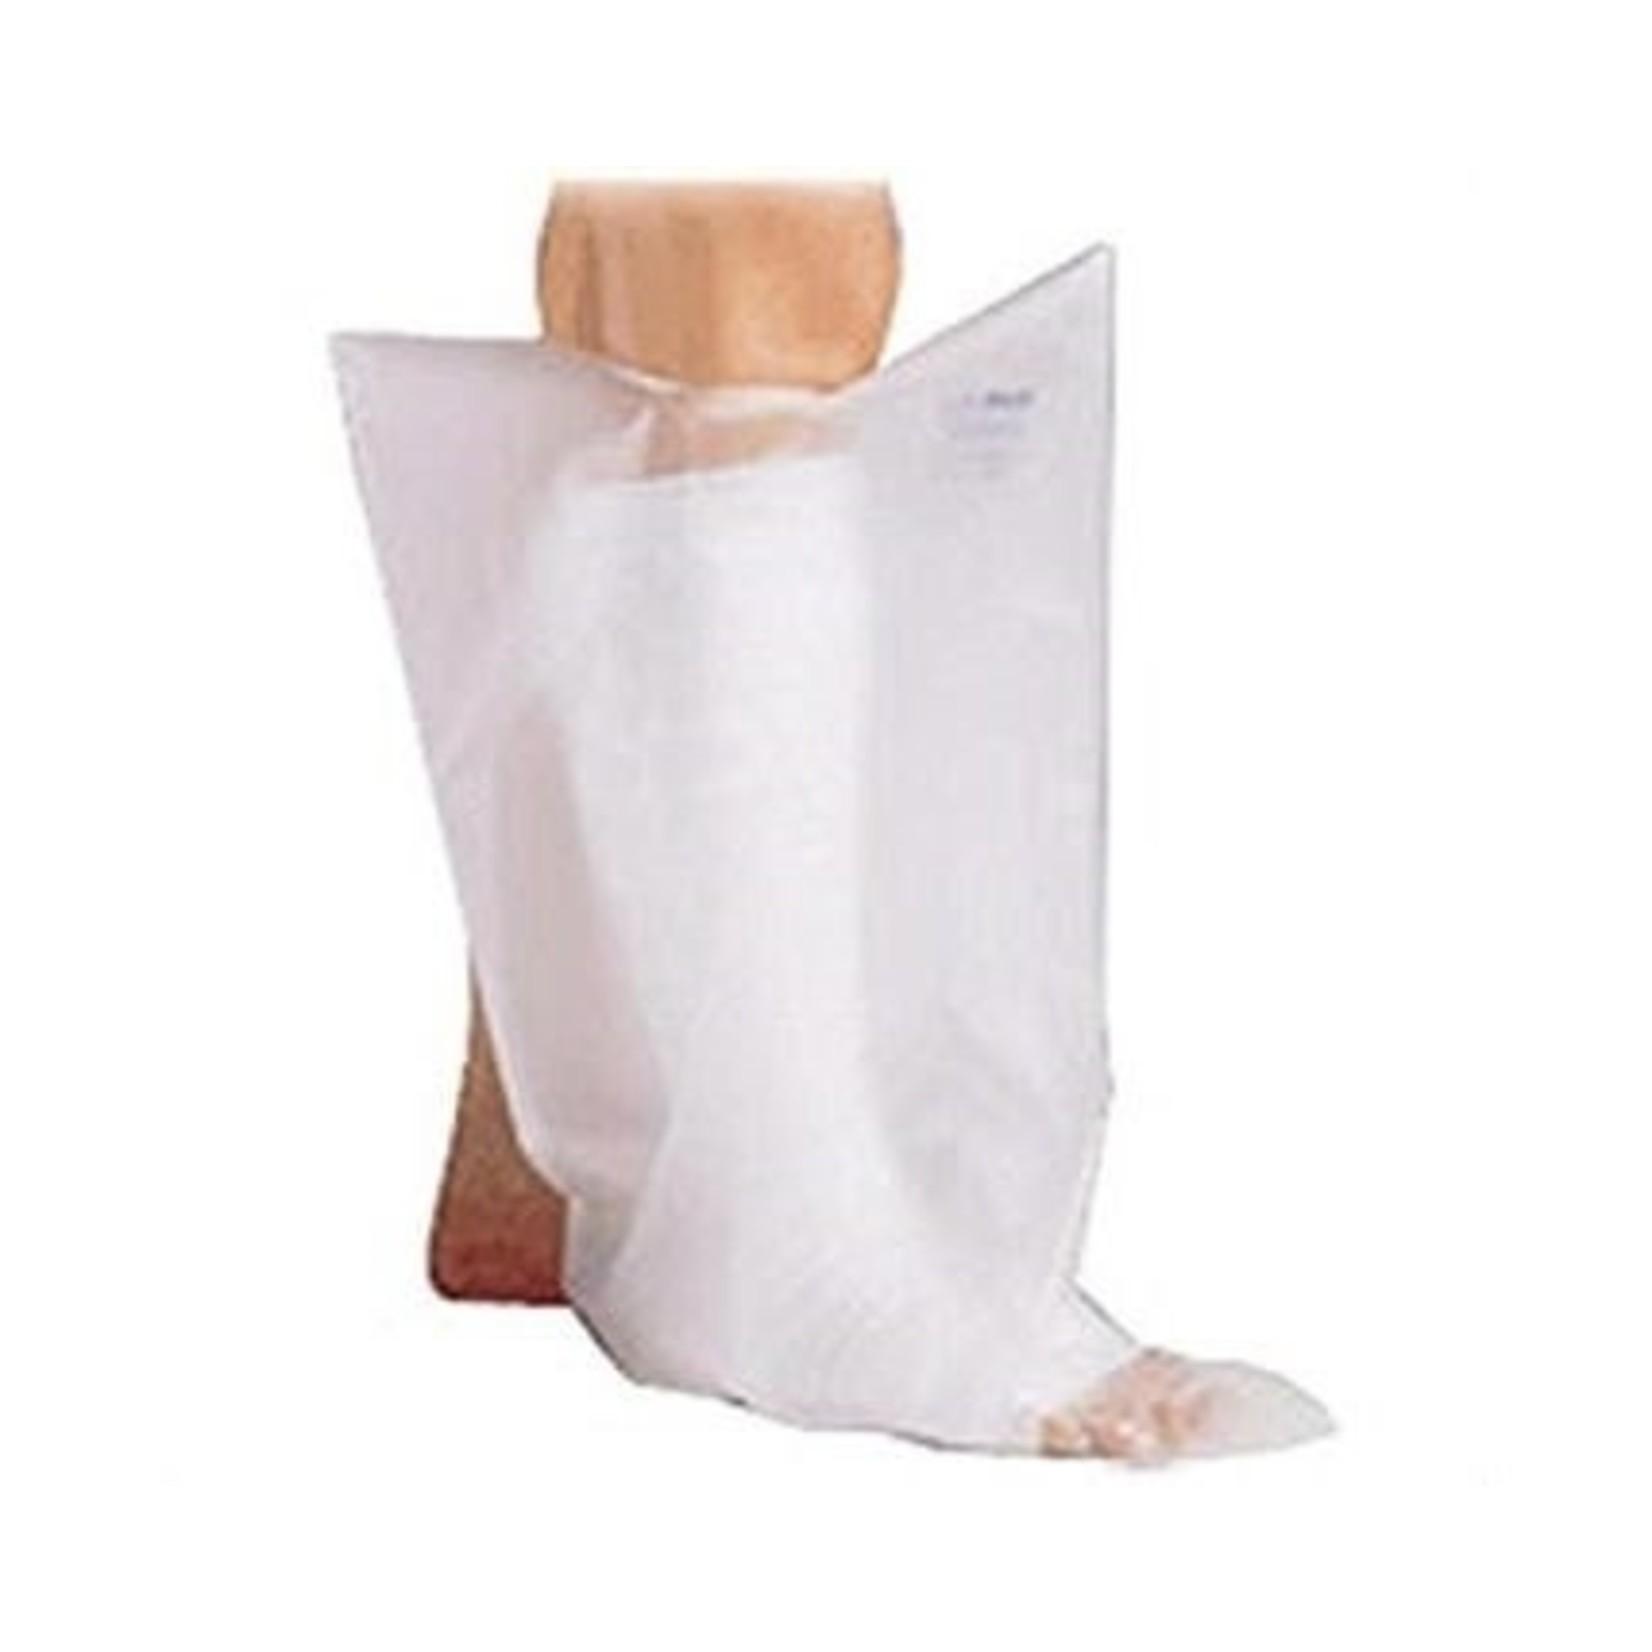 FLA Orthopedics CAST PROTECTOR SHORT LEG CHILD RET